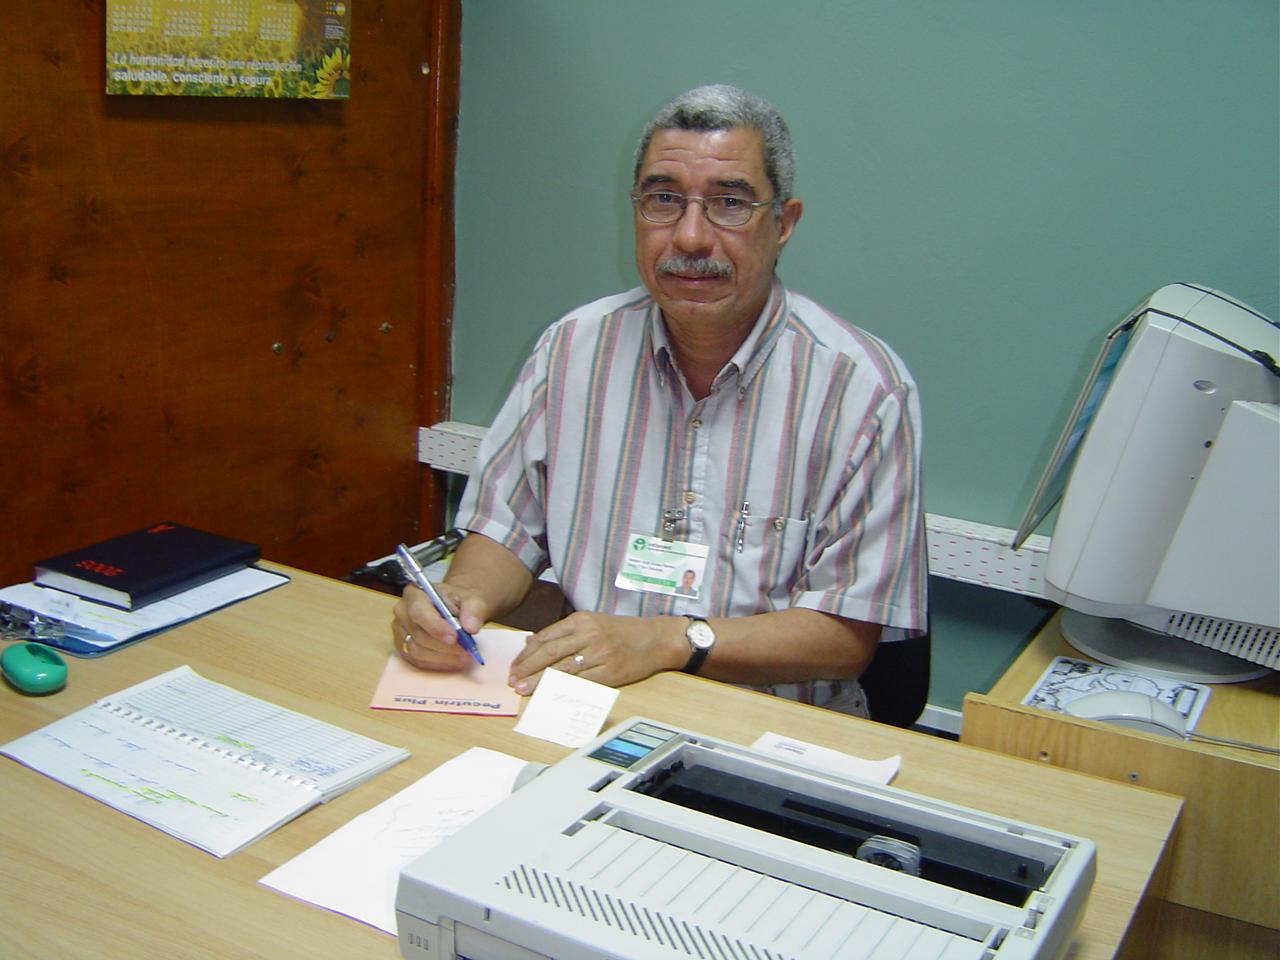 Tec. Jorge Sucasas